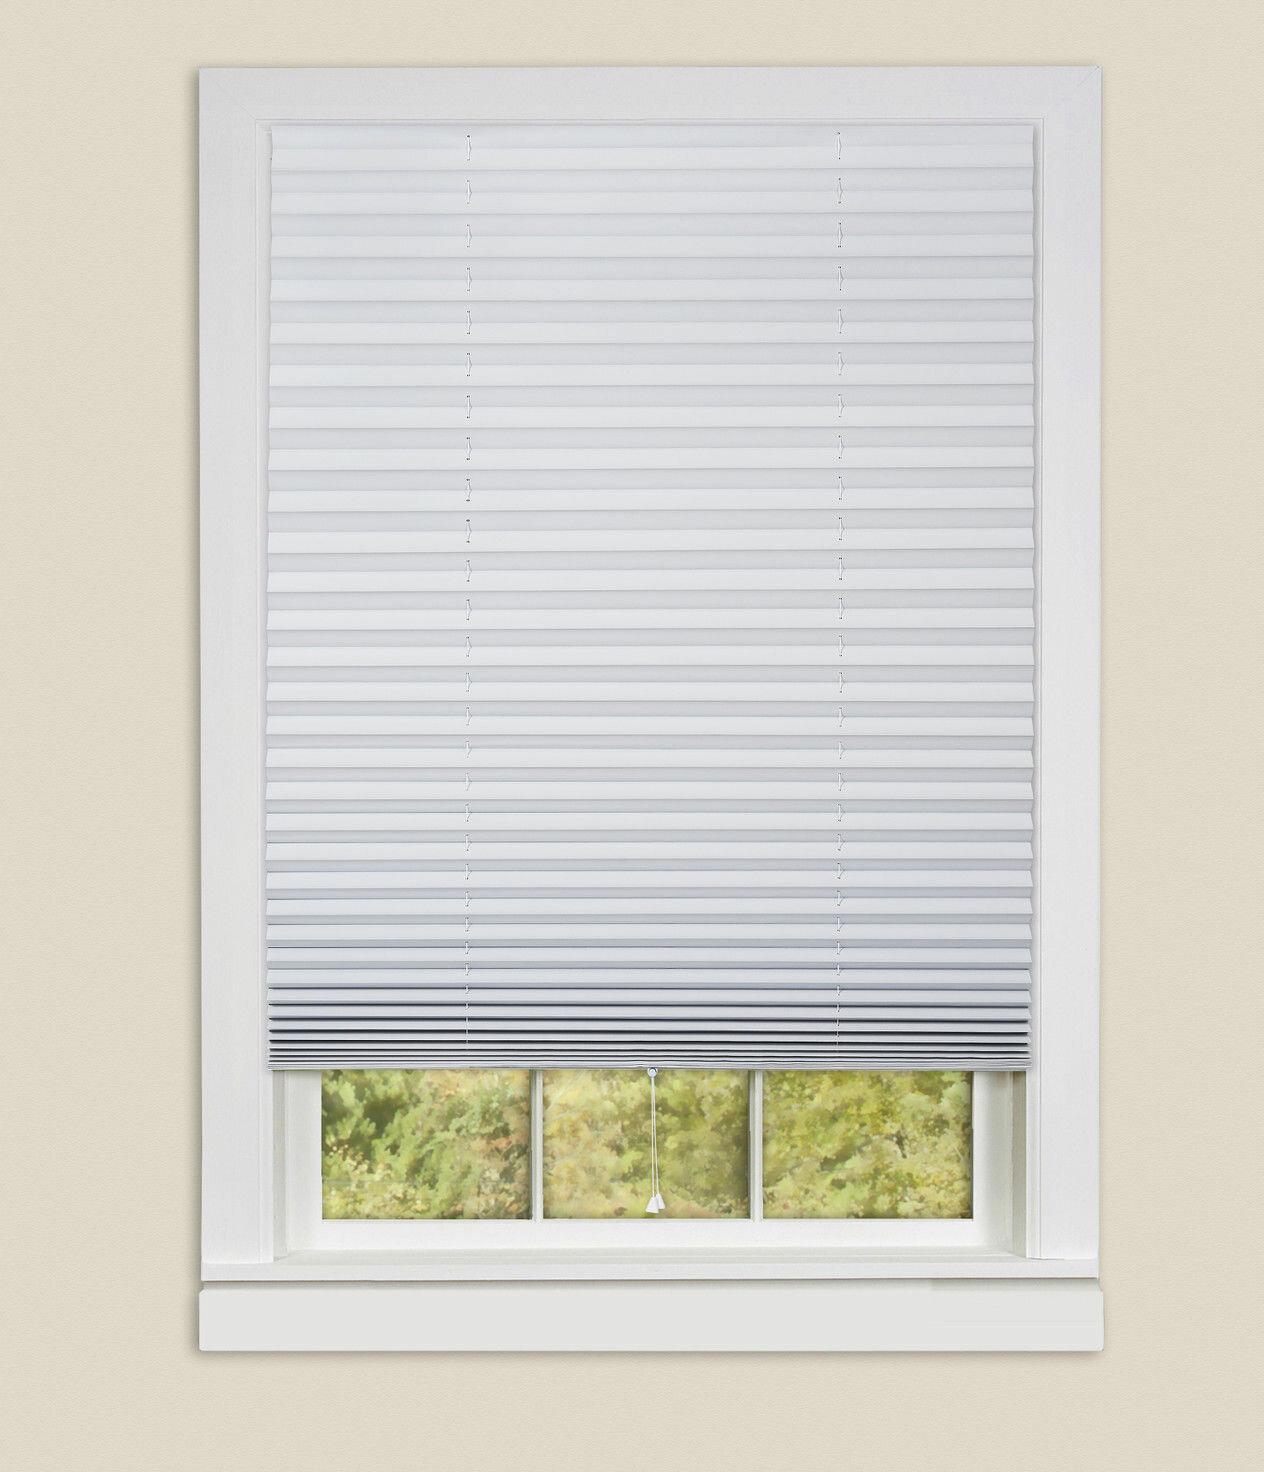 Pleated Window Curtains Shade Darkening Vinyl Blinds Half Blackout Self-Adhesive